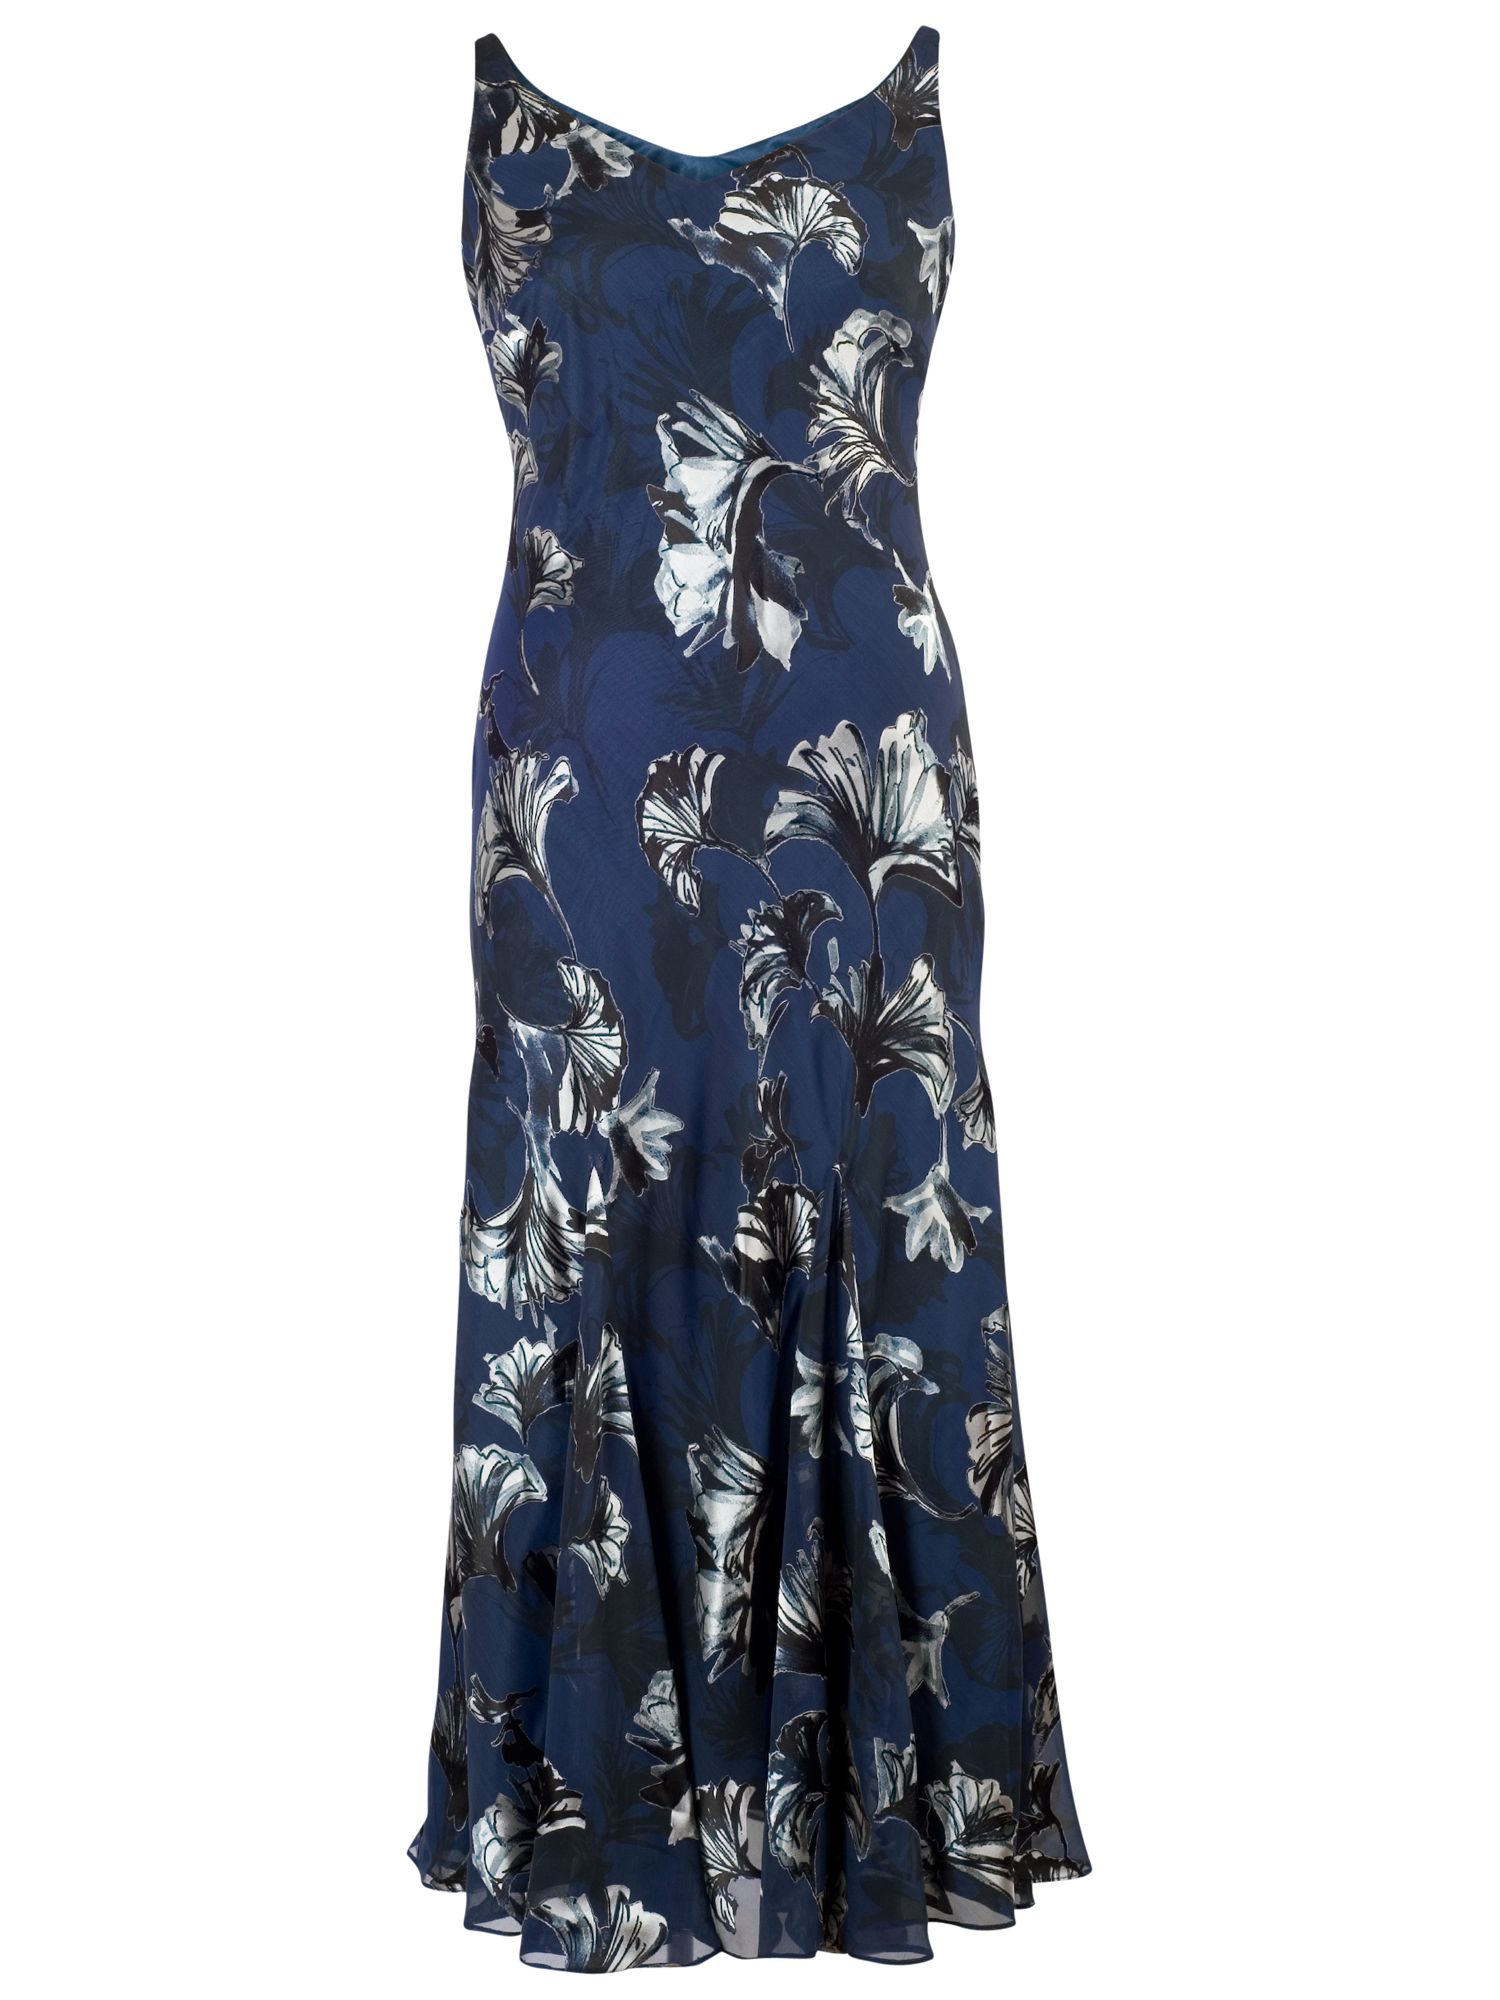 Chesca Chesca Fan Print Devoree Dress, Navy